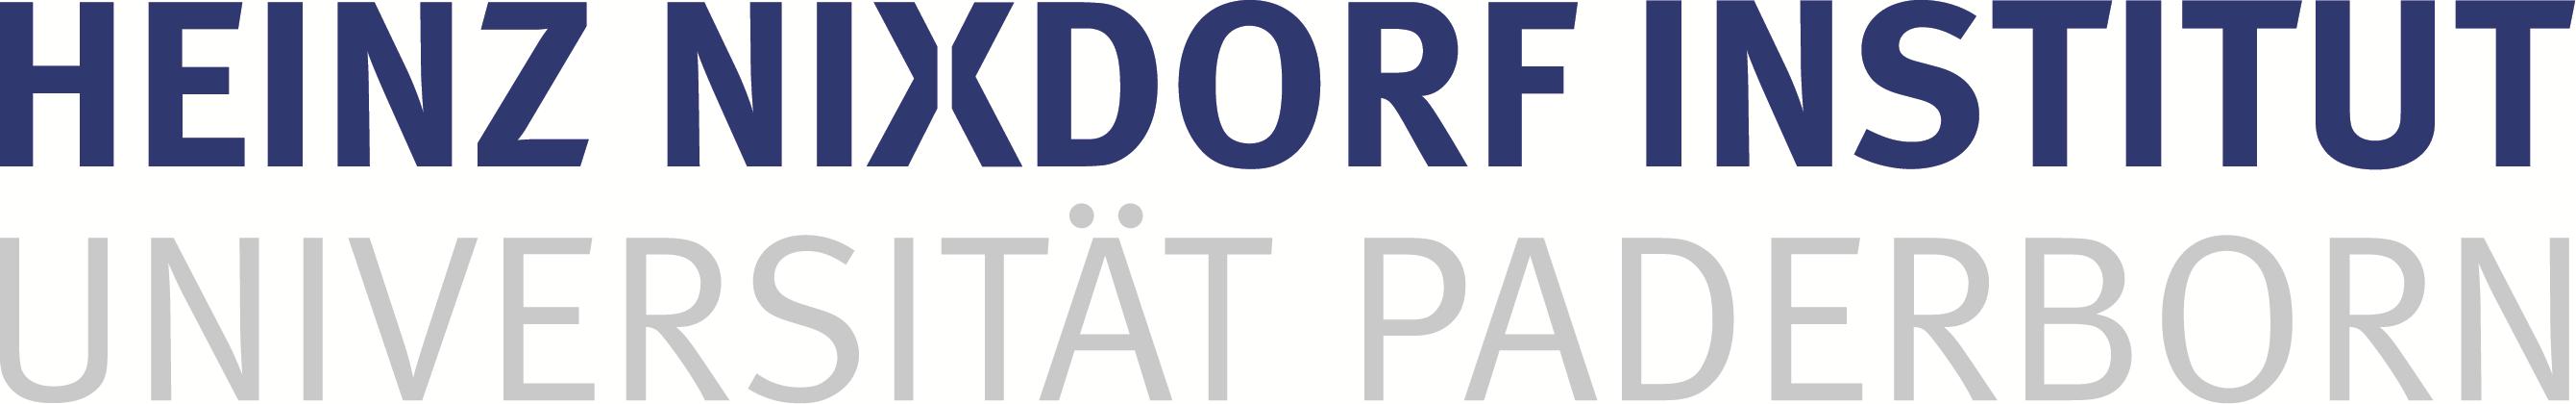 Logo_HNI_UPB